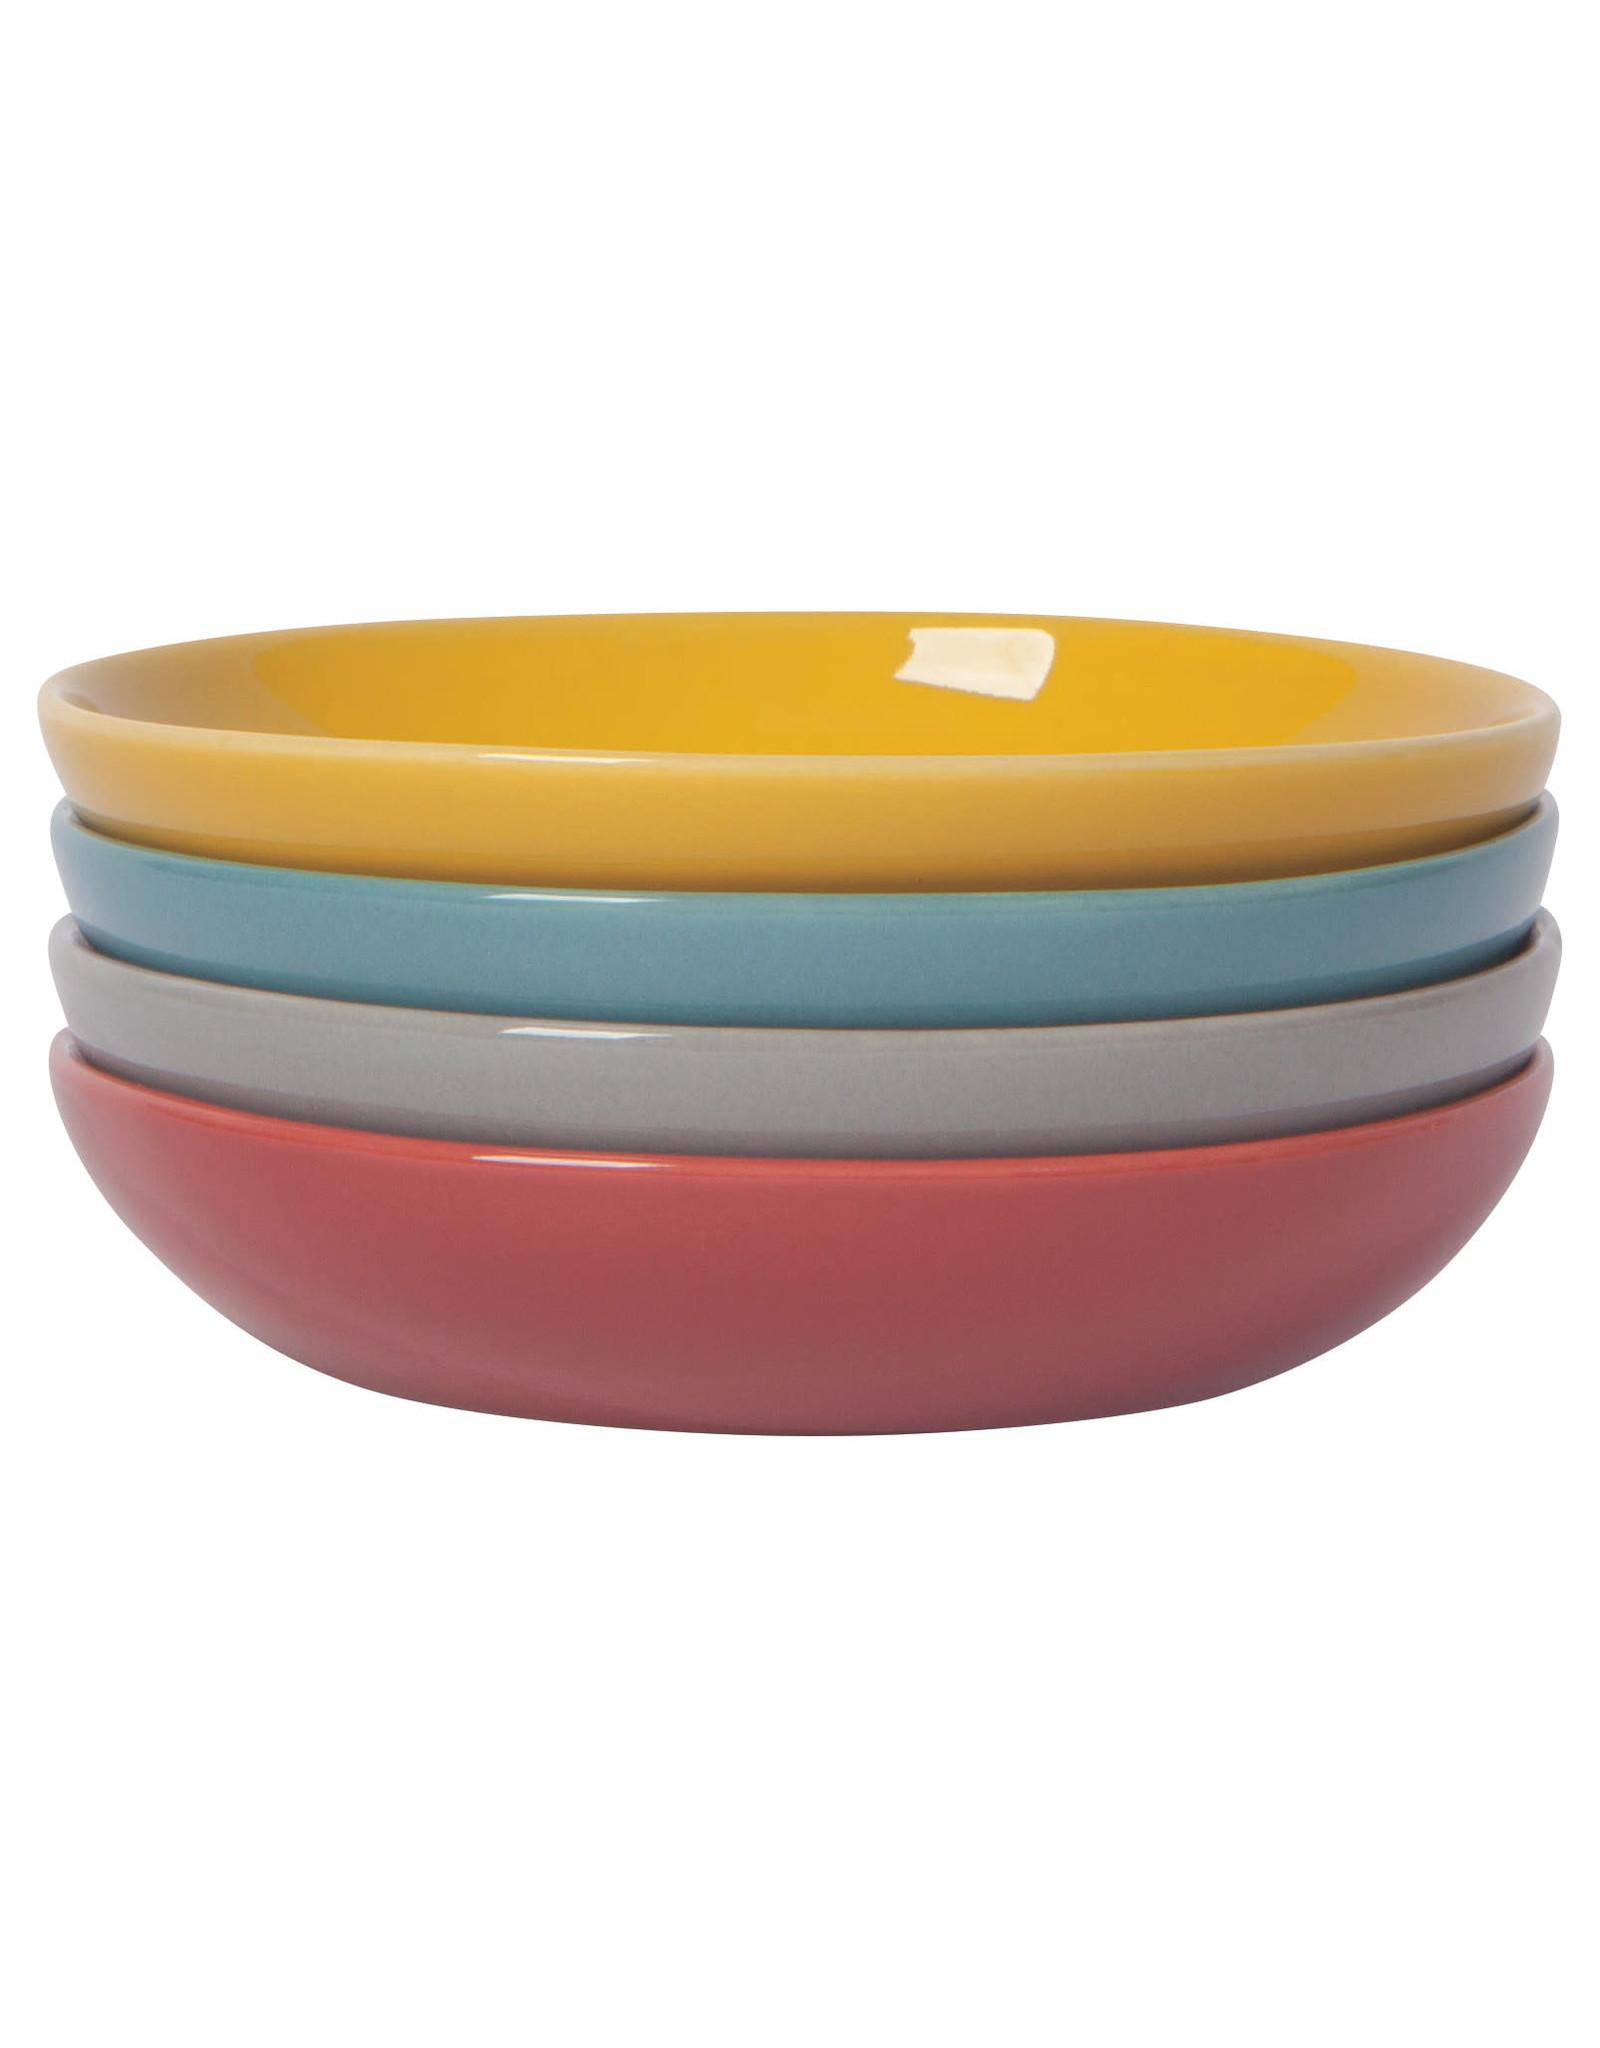 Danica Danica - Dipping Dishes - Canyon Set/4